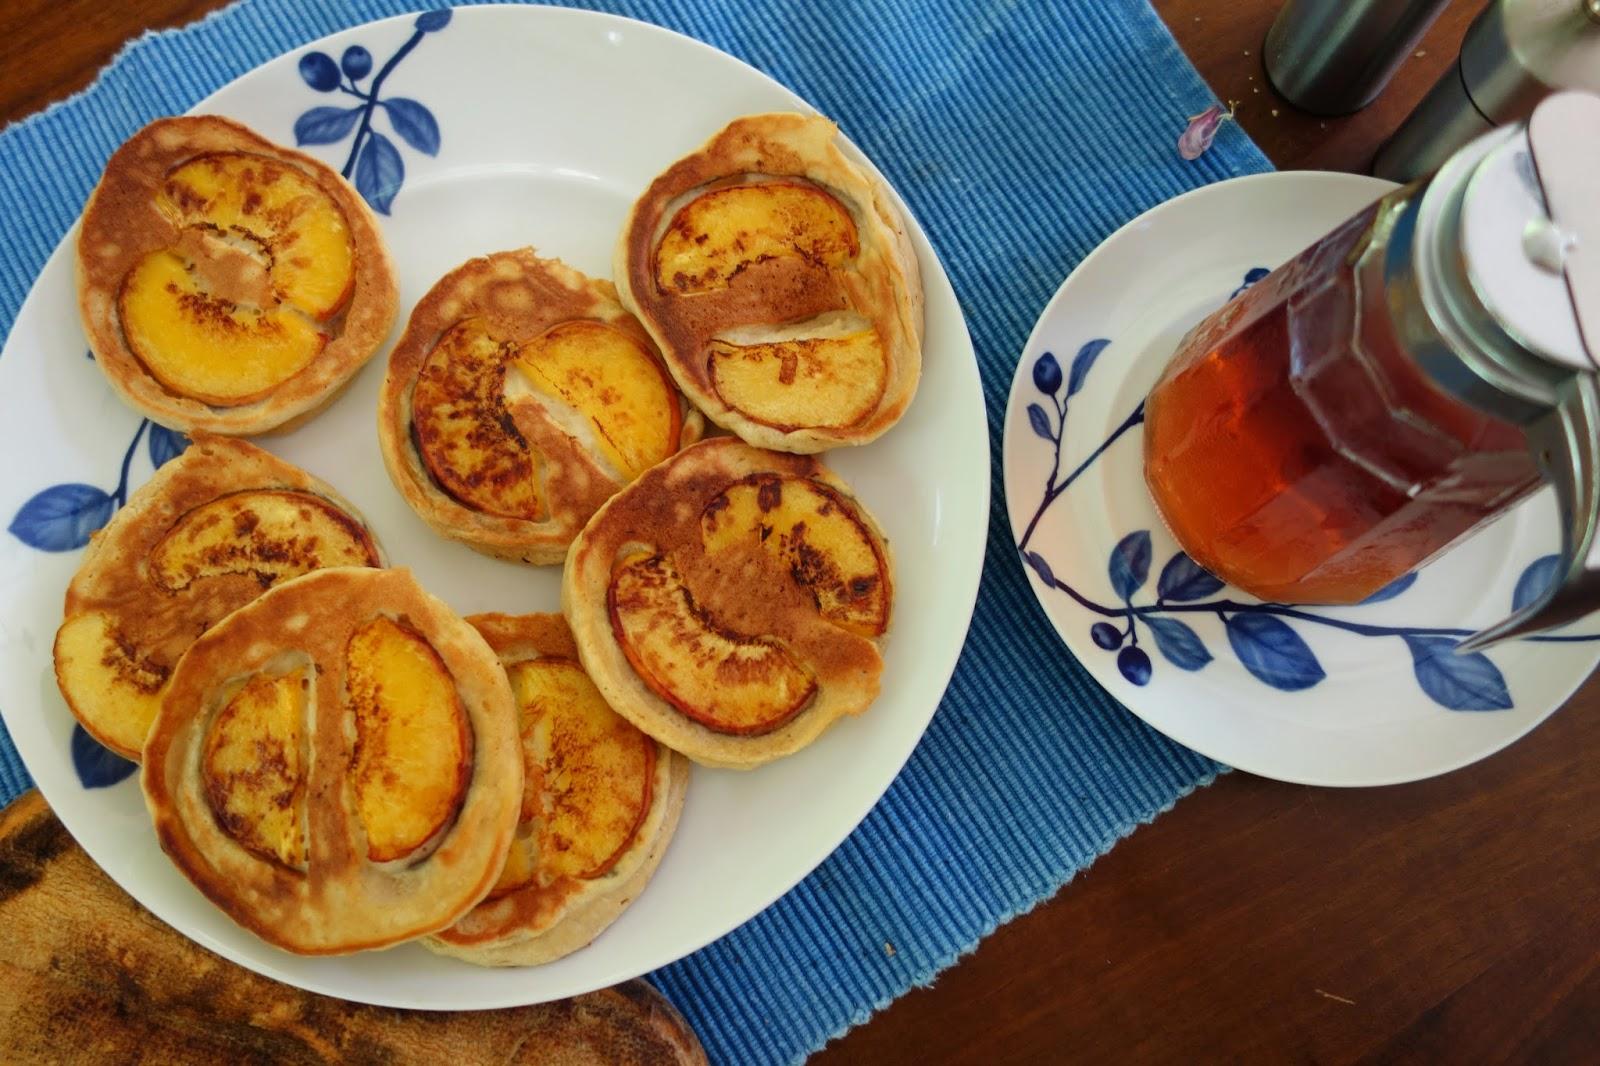 milk and blackberries: Banana-Java Pancakes and Peach-Sour Cream ...